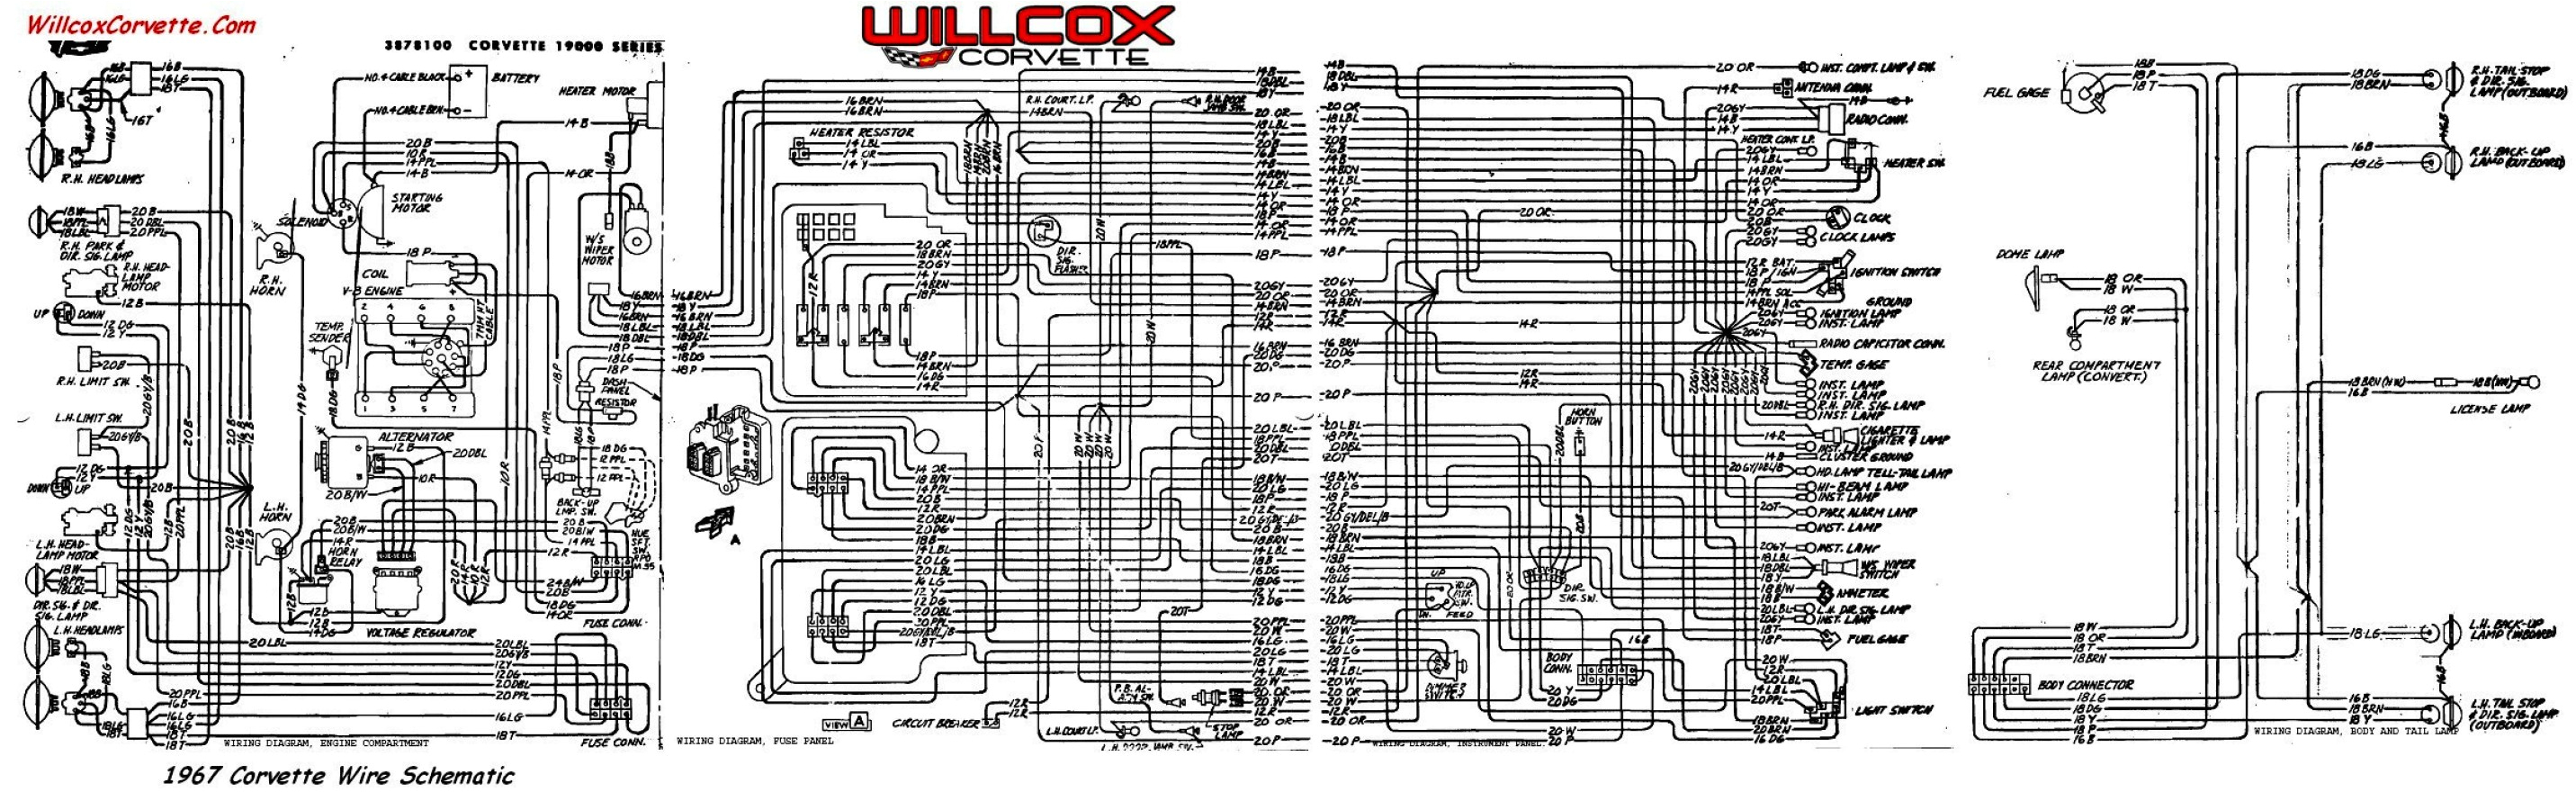 corvette wiring diagrams wiring diagram view 1995 corvette engine wiring diagram 1995 corvette wiring diagram